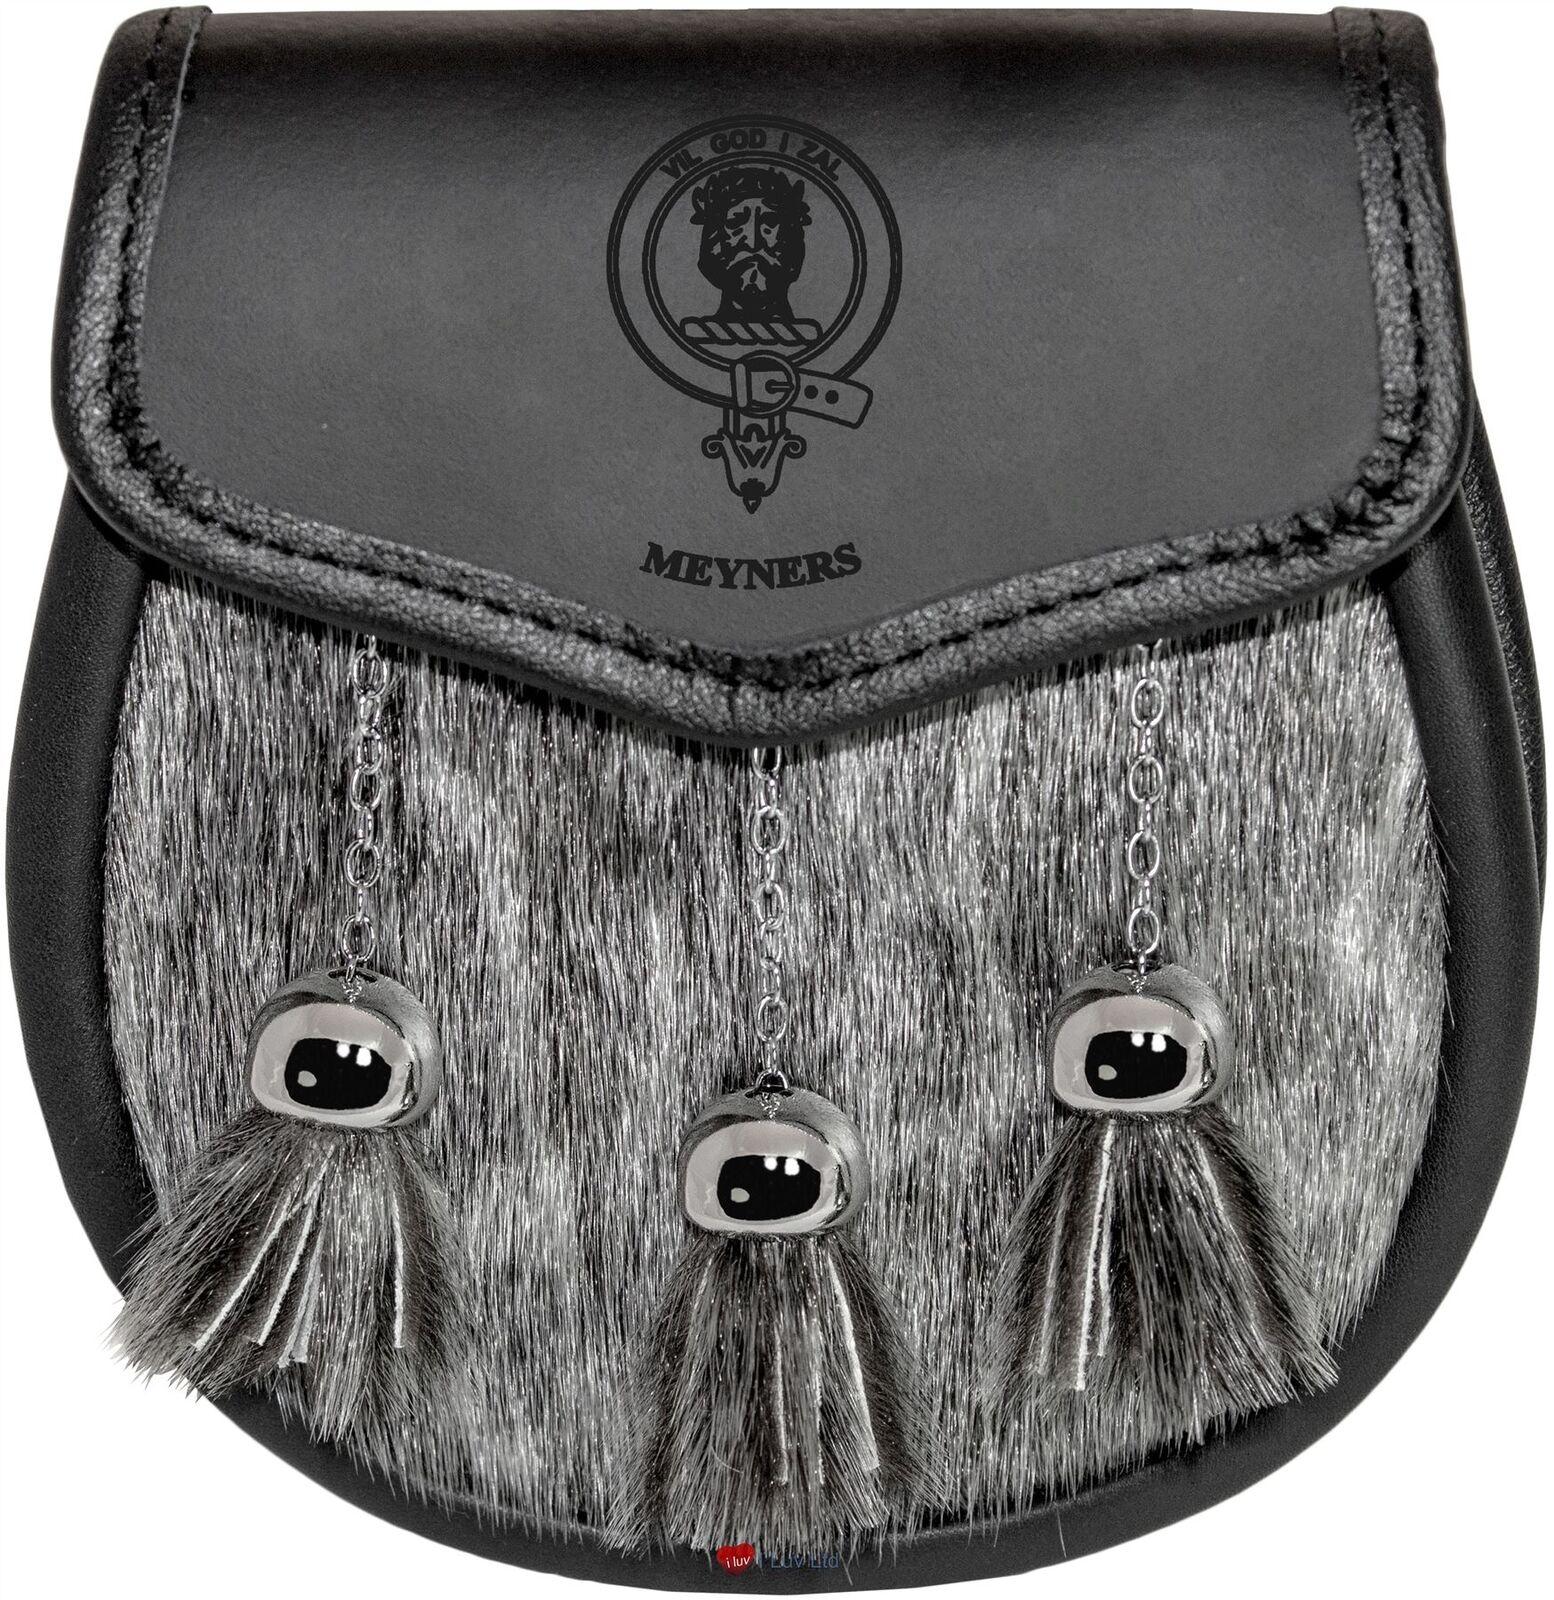 Meyners Semi Dress Sporran Fur Plain Leather Flap Scottish Clan Crest